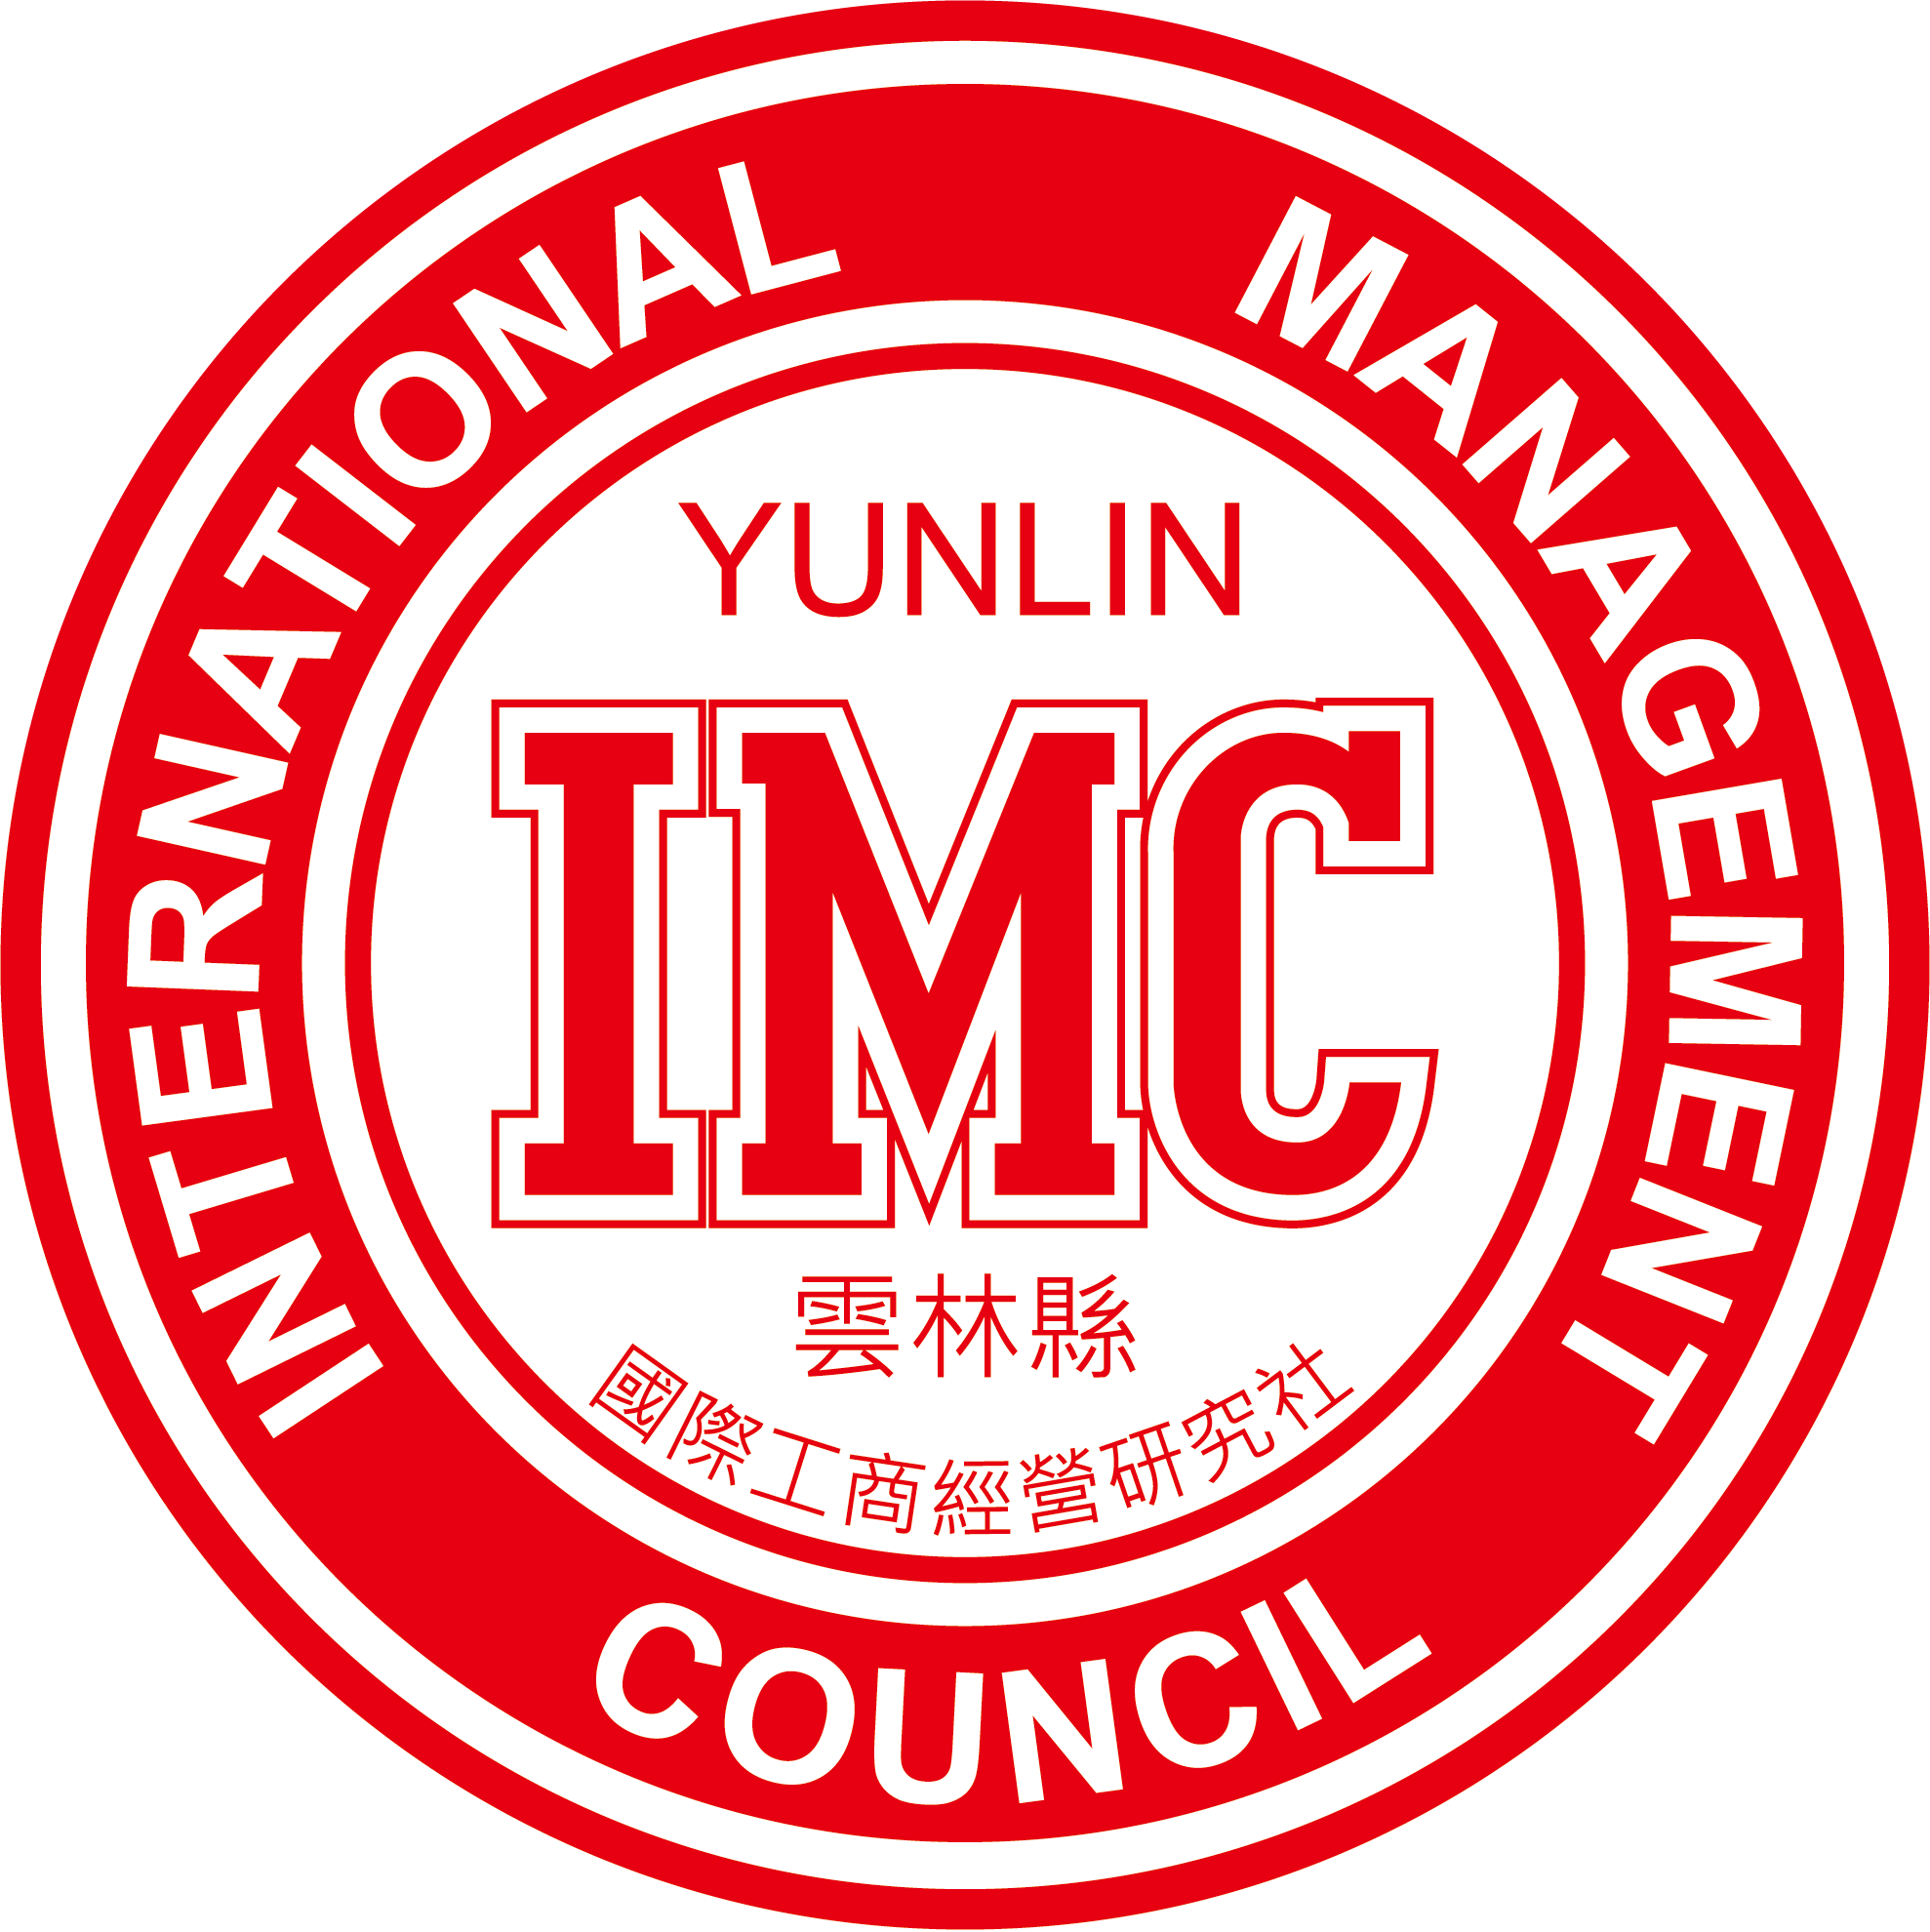 IMC 雲林社IMC Logo